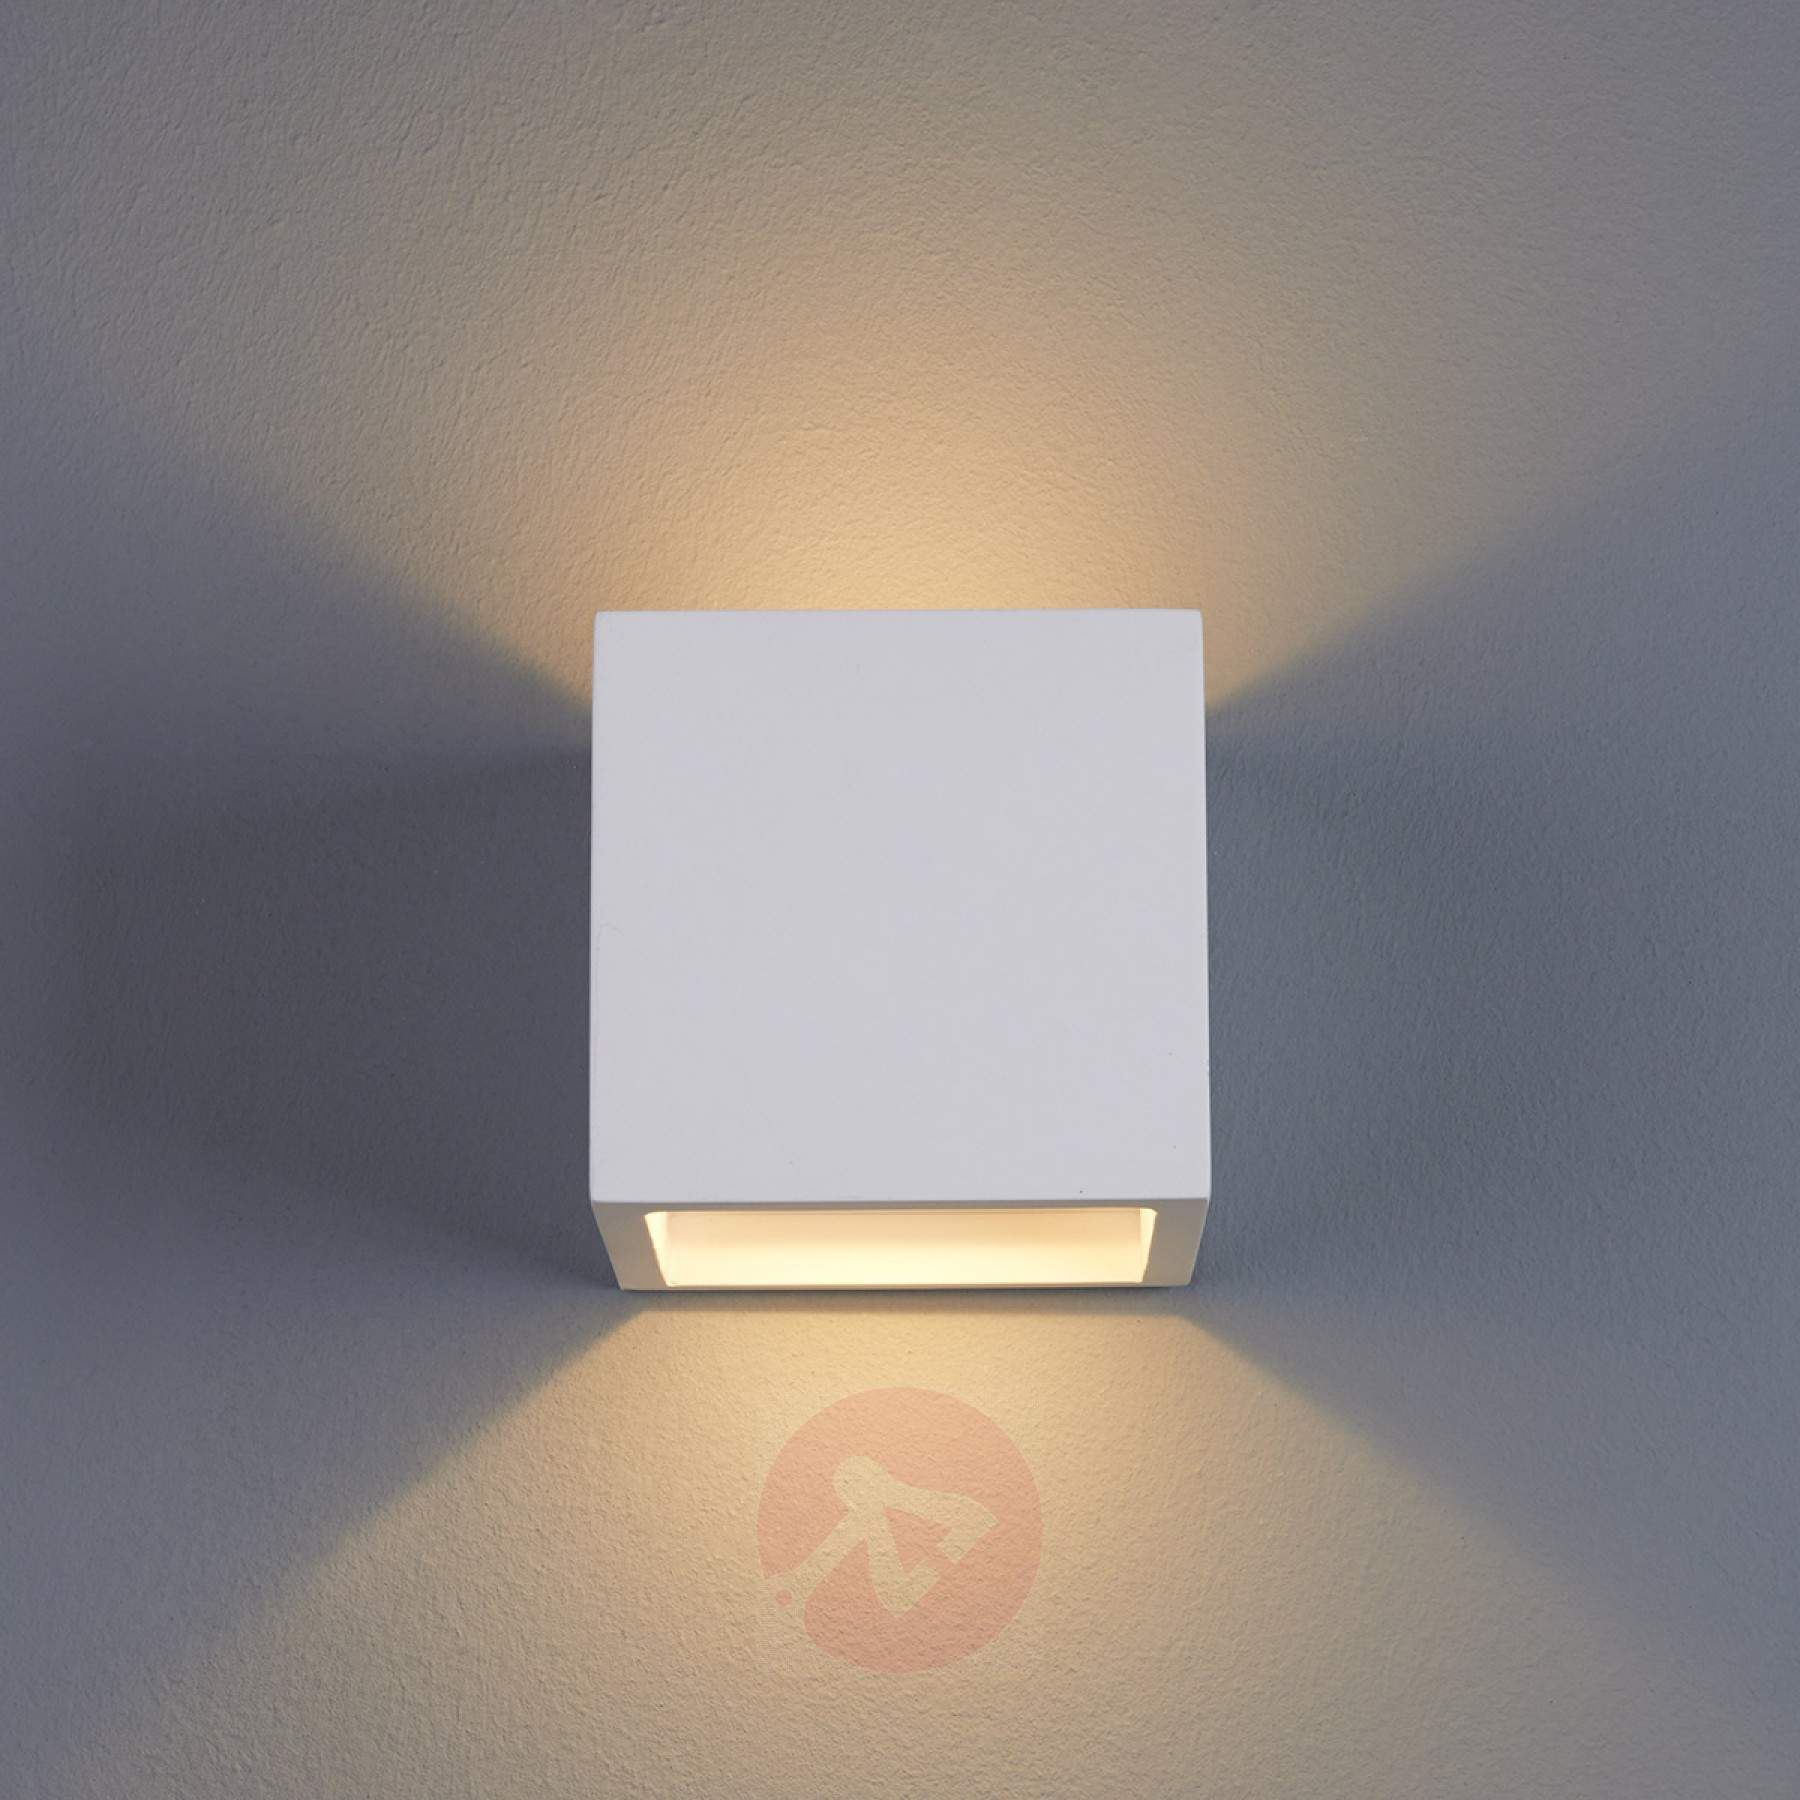 Marita Led Wall Light Cube Shaped Plaster 9613038 01 Bina Patel In 2019 Led Wall Lights Wall Lights Plaster